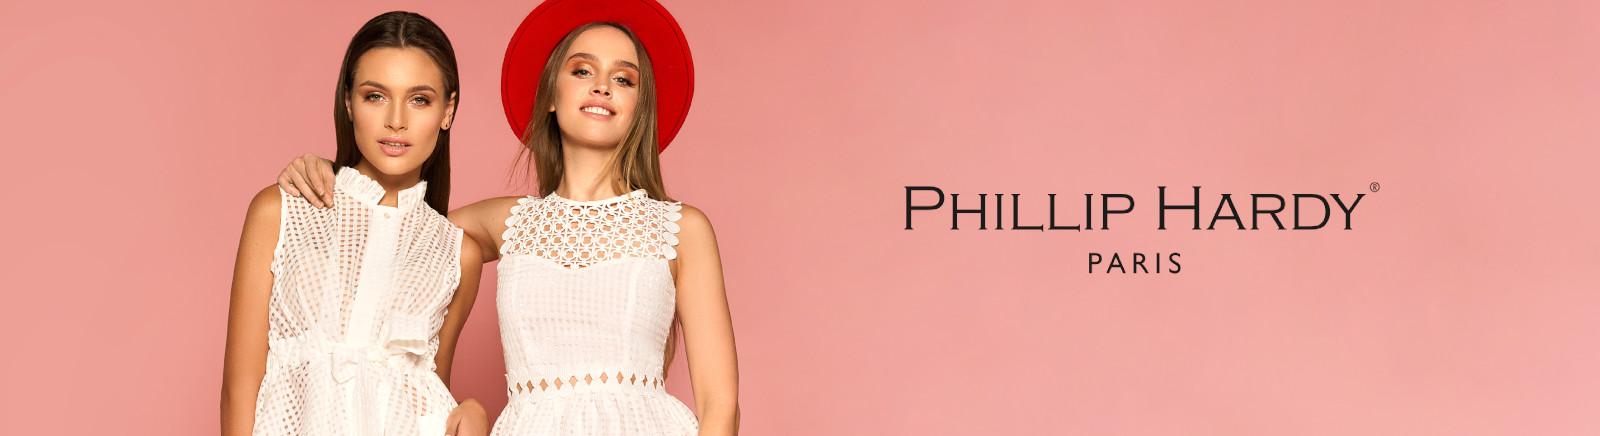 Juppen: Phillip Hardy Slingpumps für Damen online shoppen